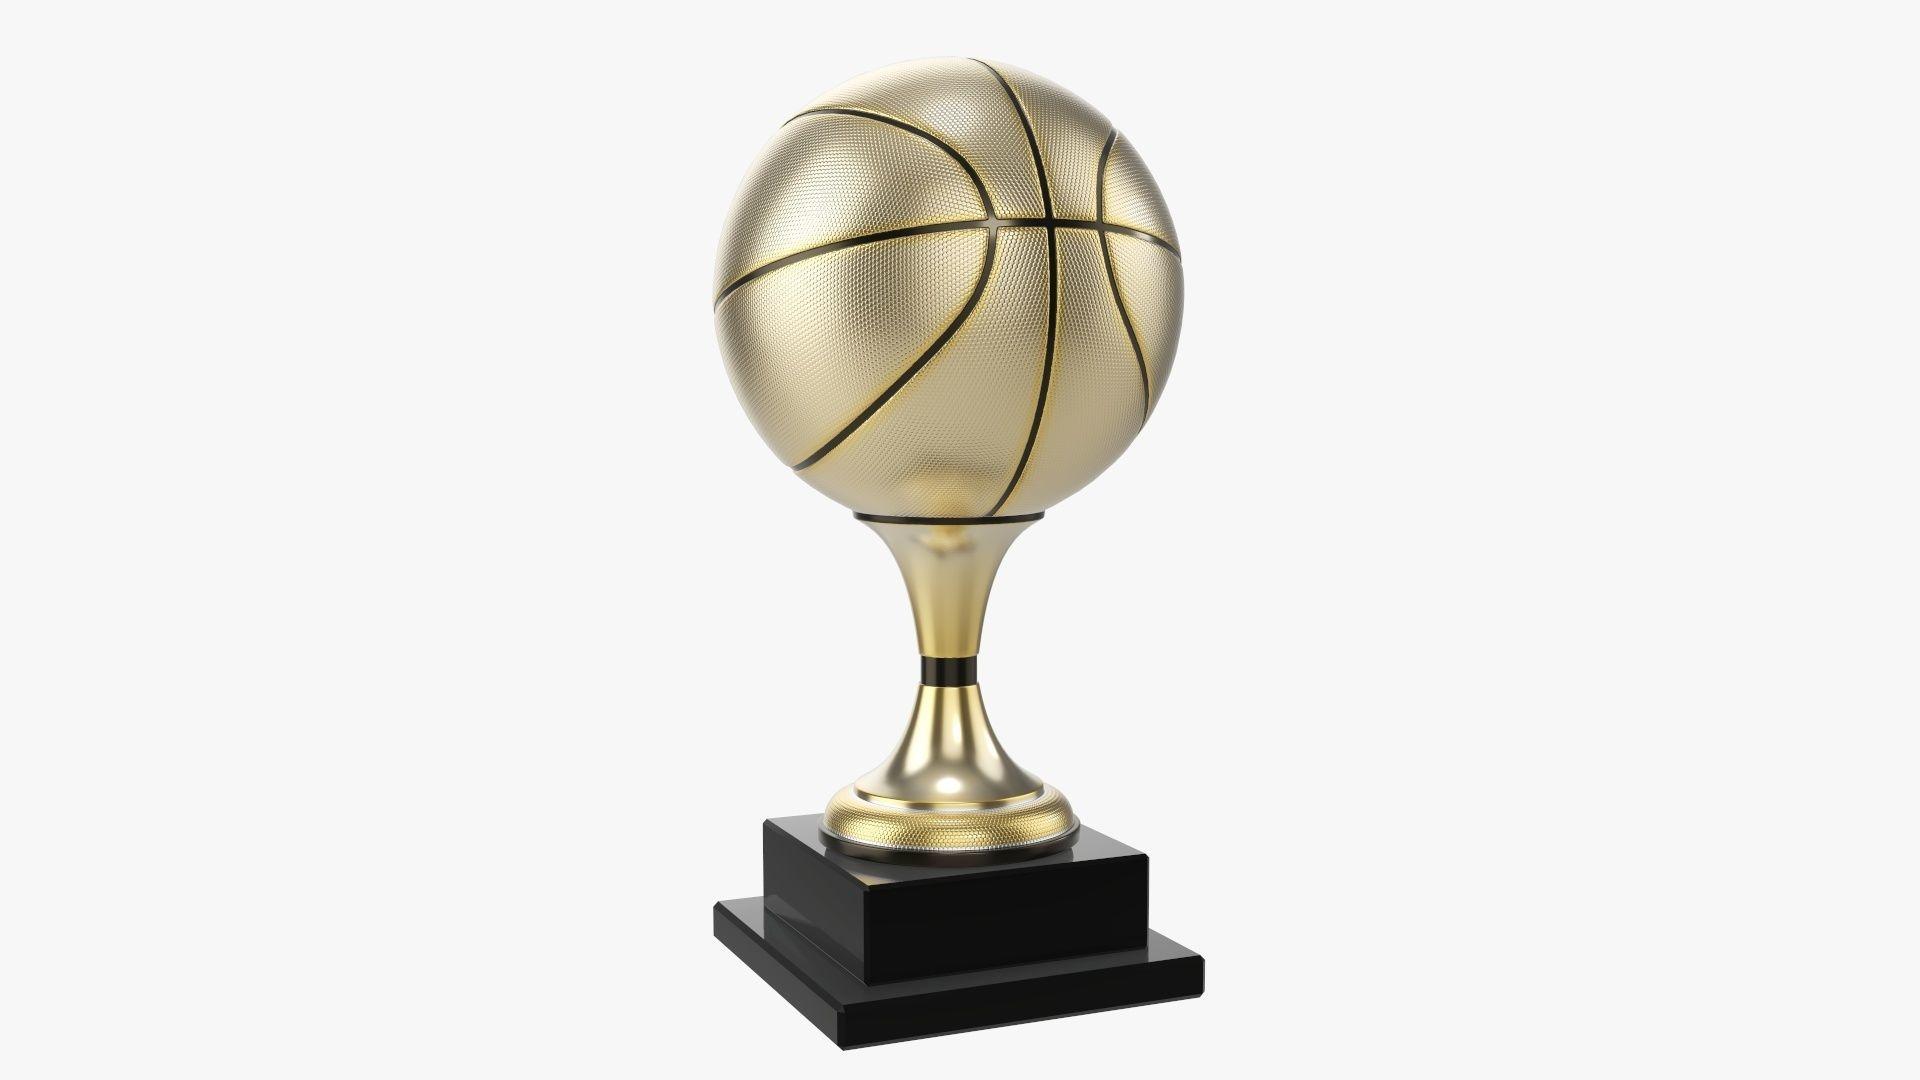 Trophy ball basketball